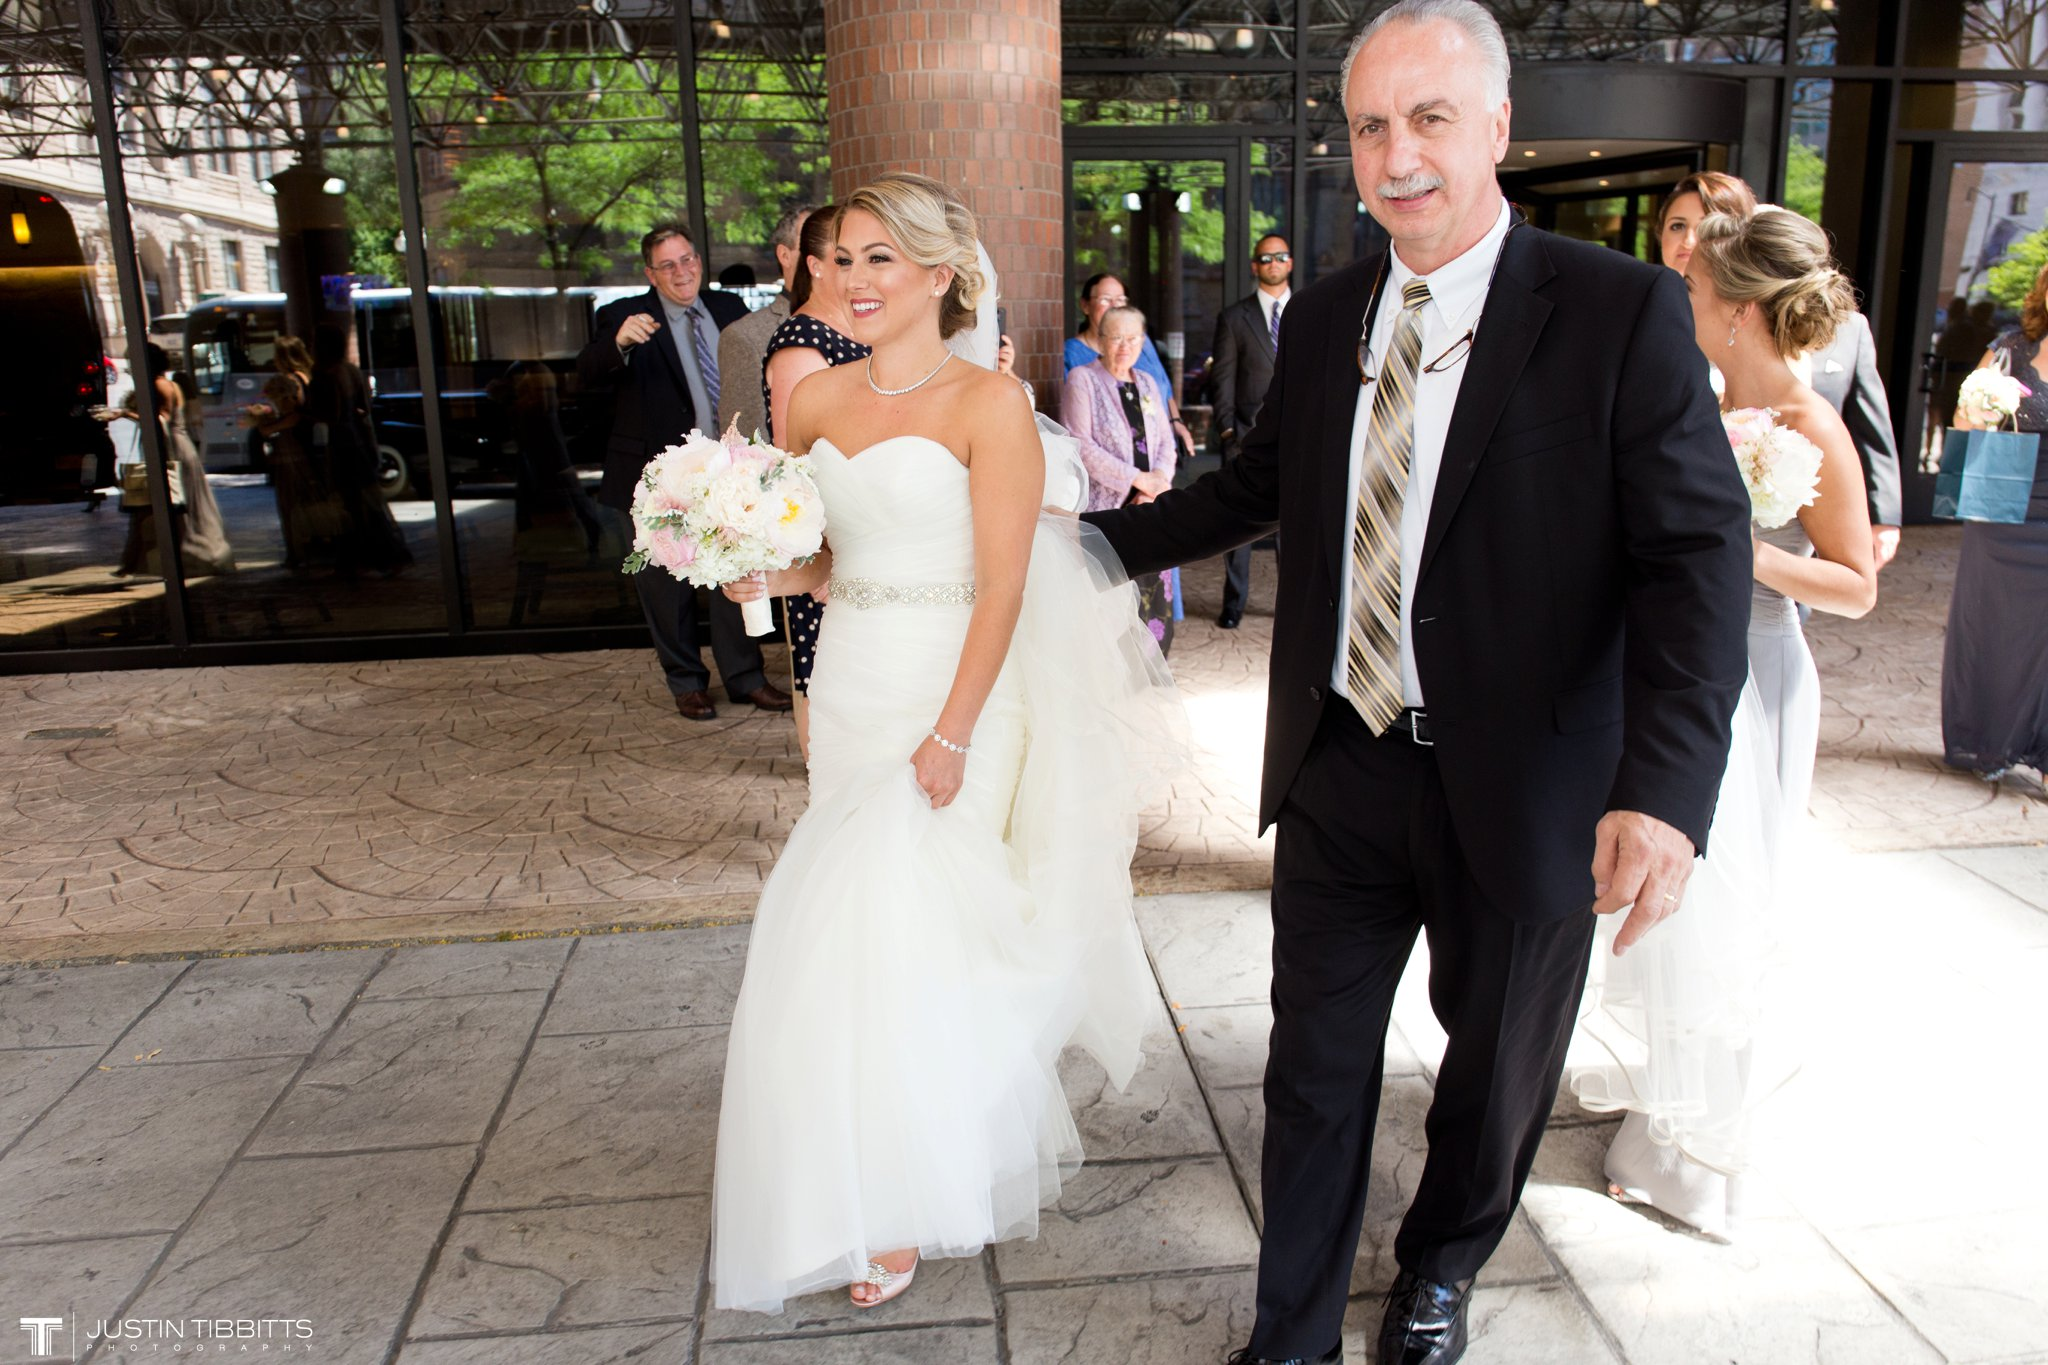 state-room-wedding-photos-with-amanda-and-nick_0059